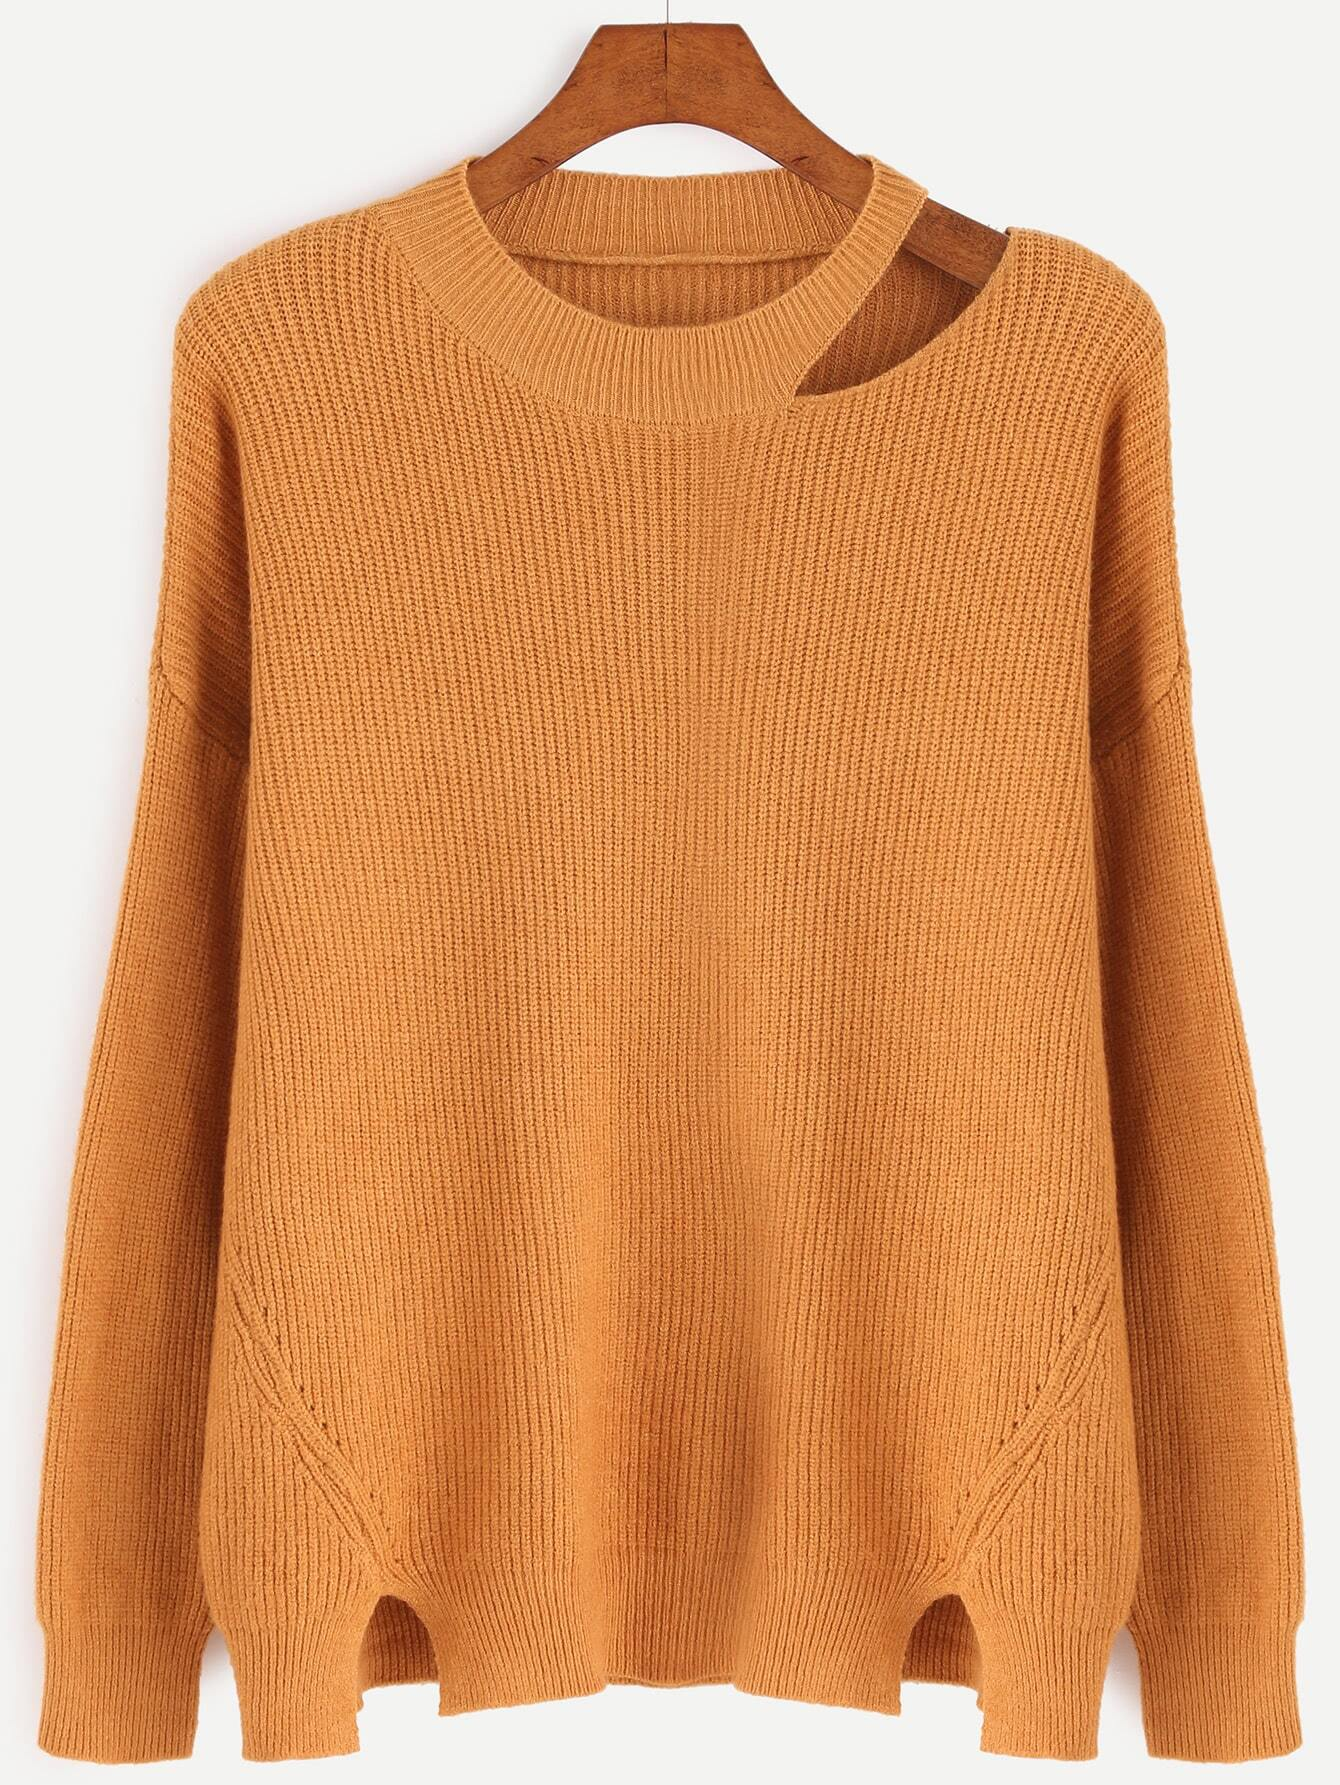 Khaki Cut Out Neck Slit Side Sweater sweater161021006